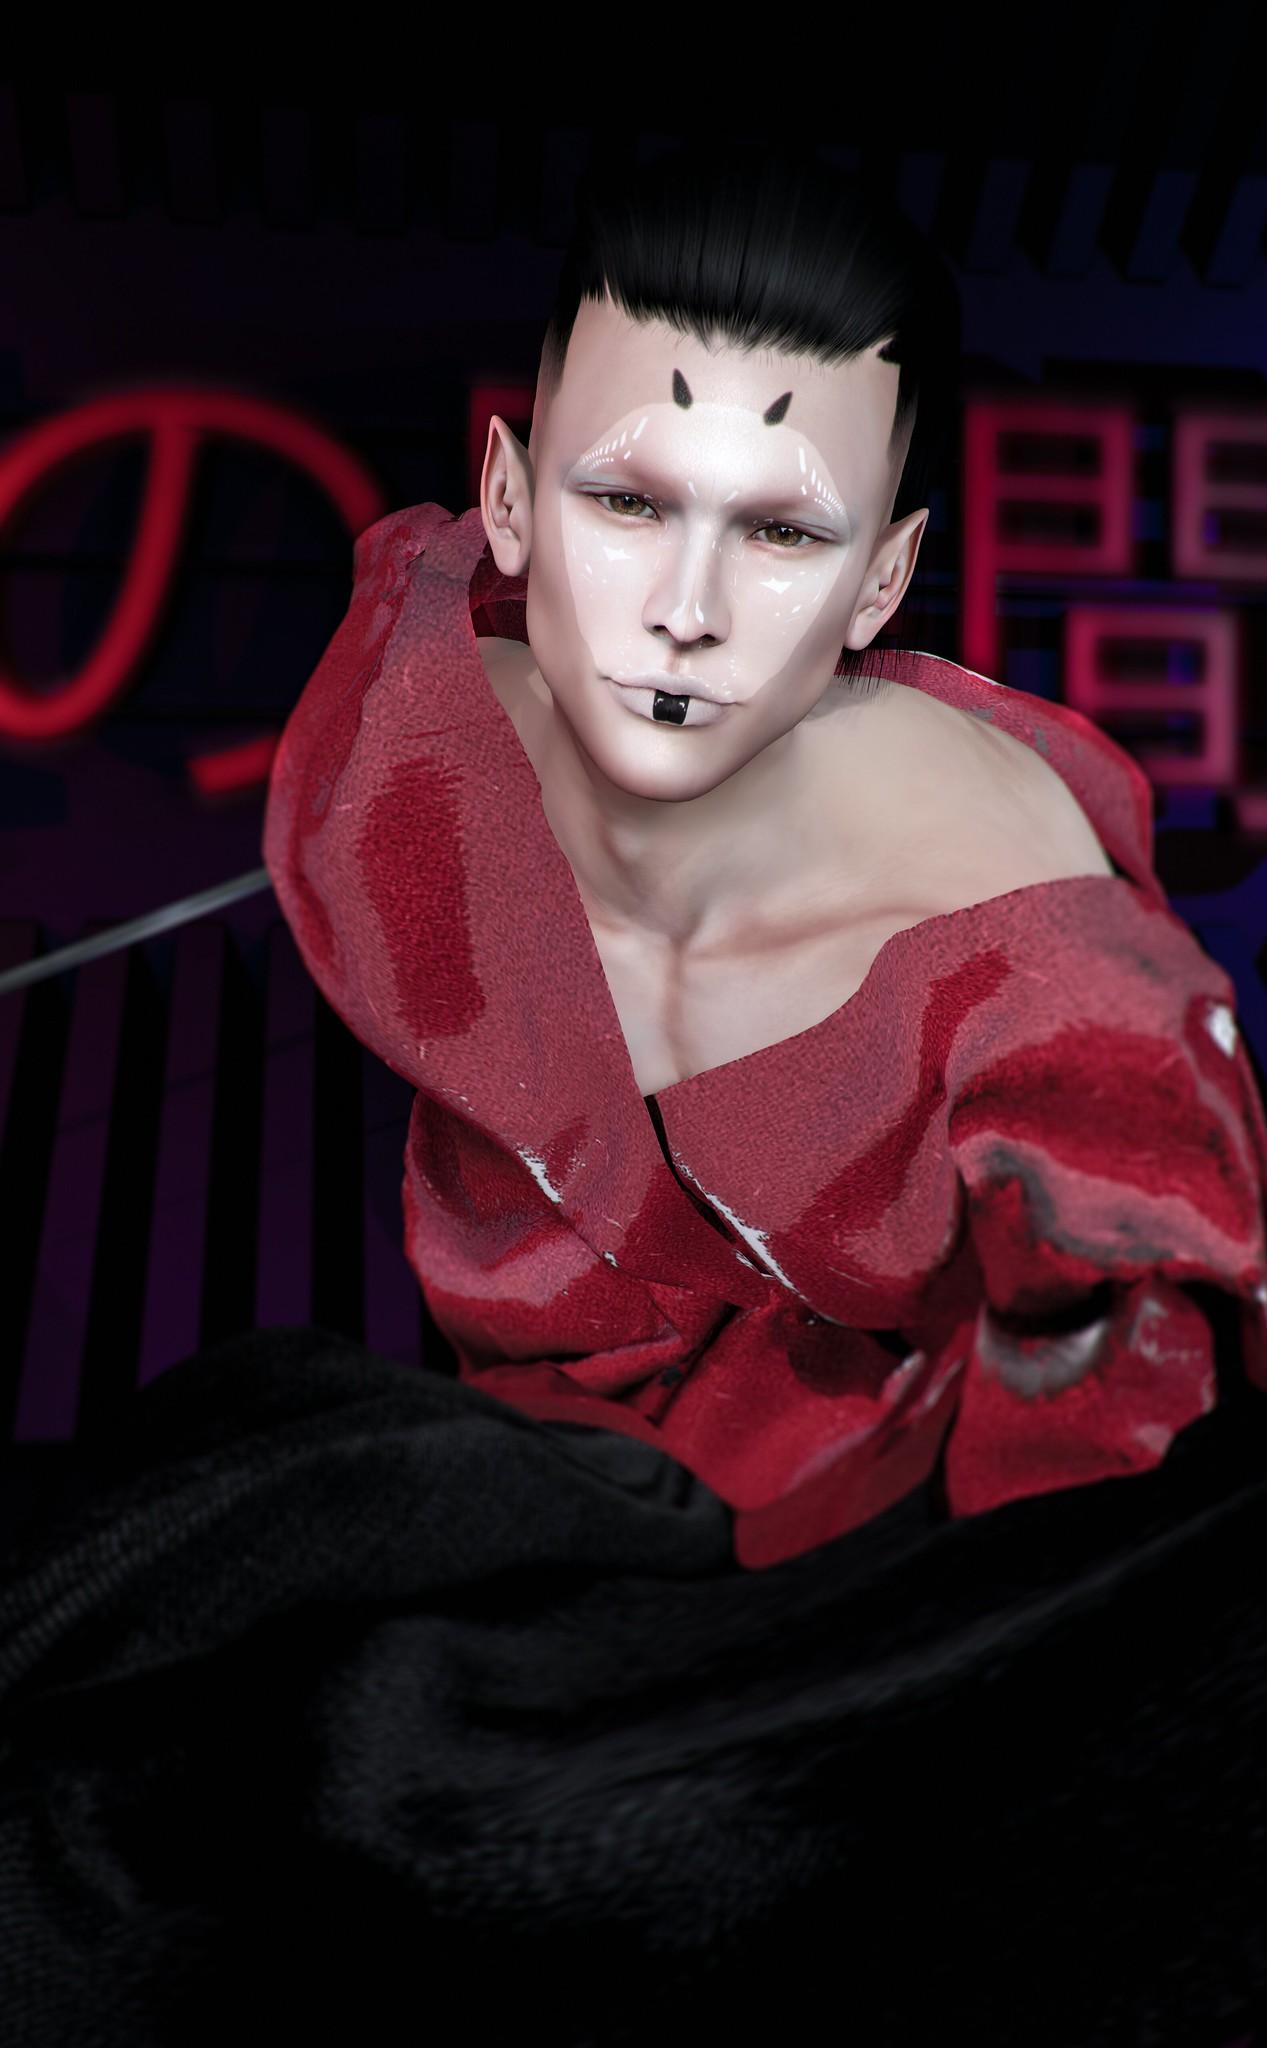 Clef de Peau.Sen skin @ Neo Japan.